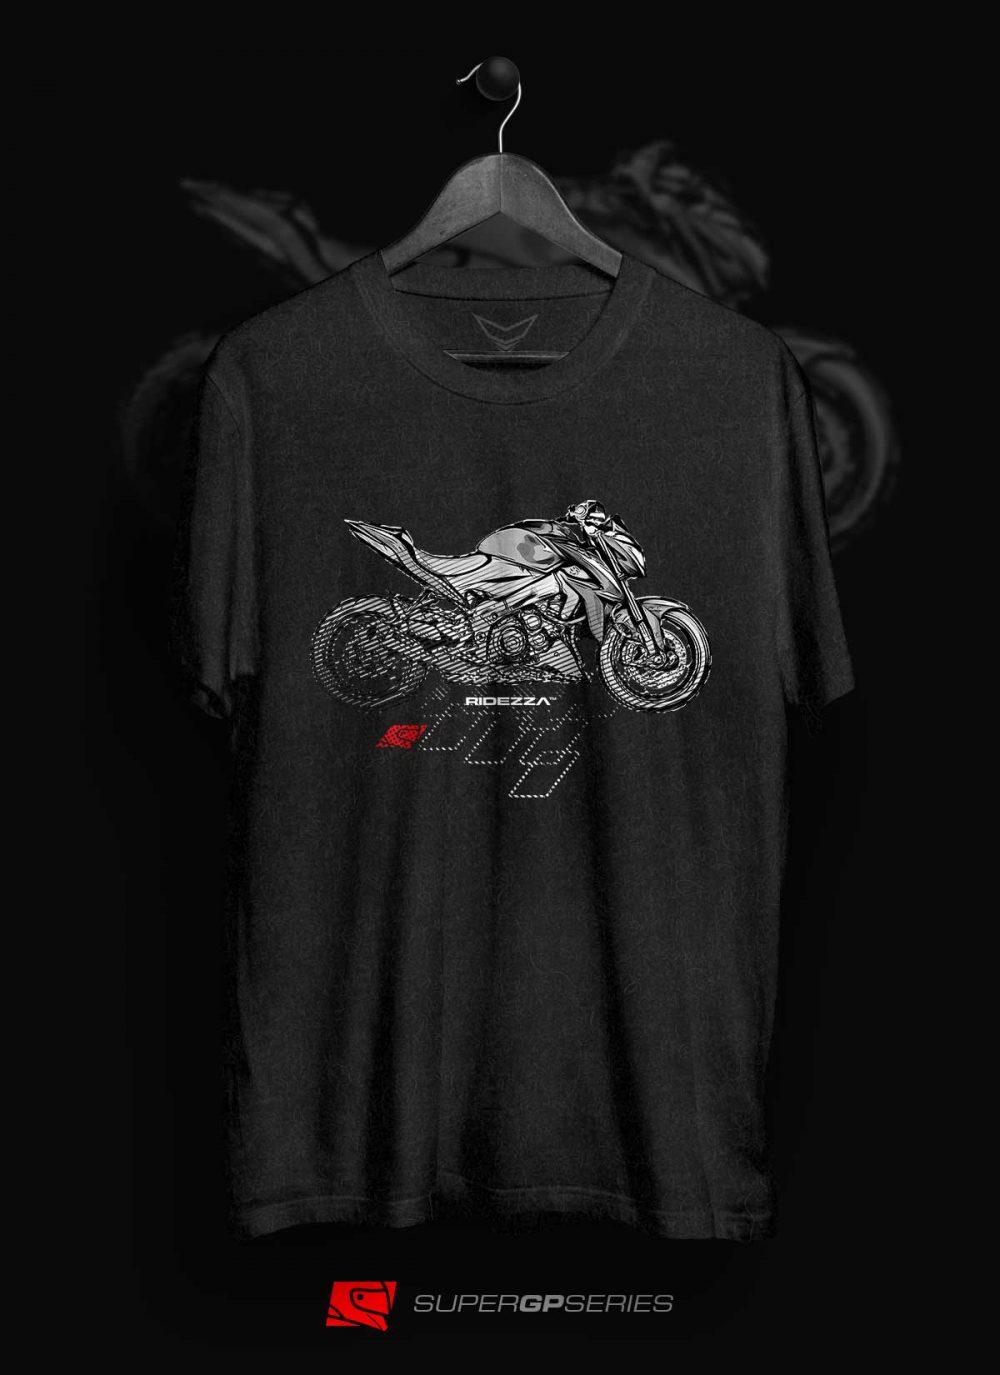 Ridezza GSX-S1000 SuperGP Series T-Shirt